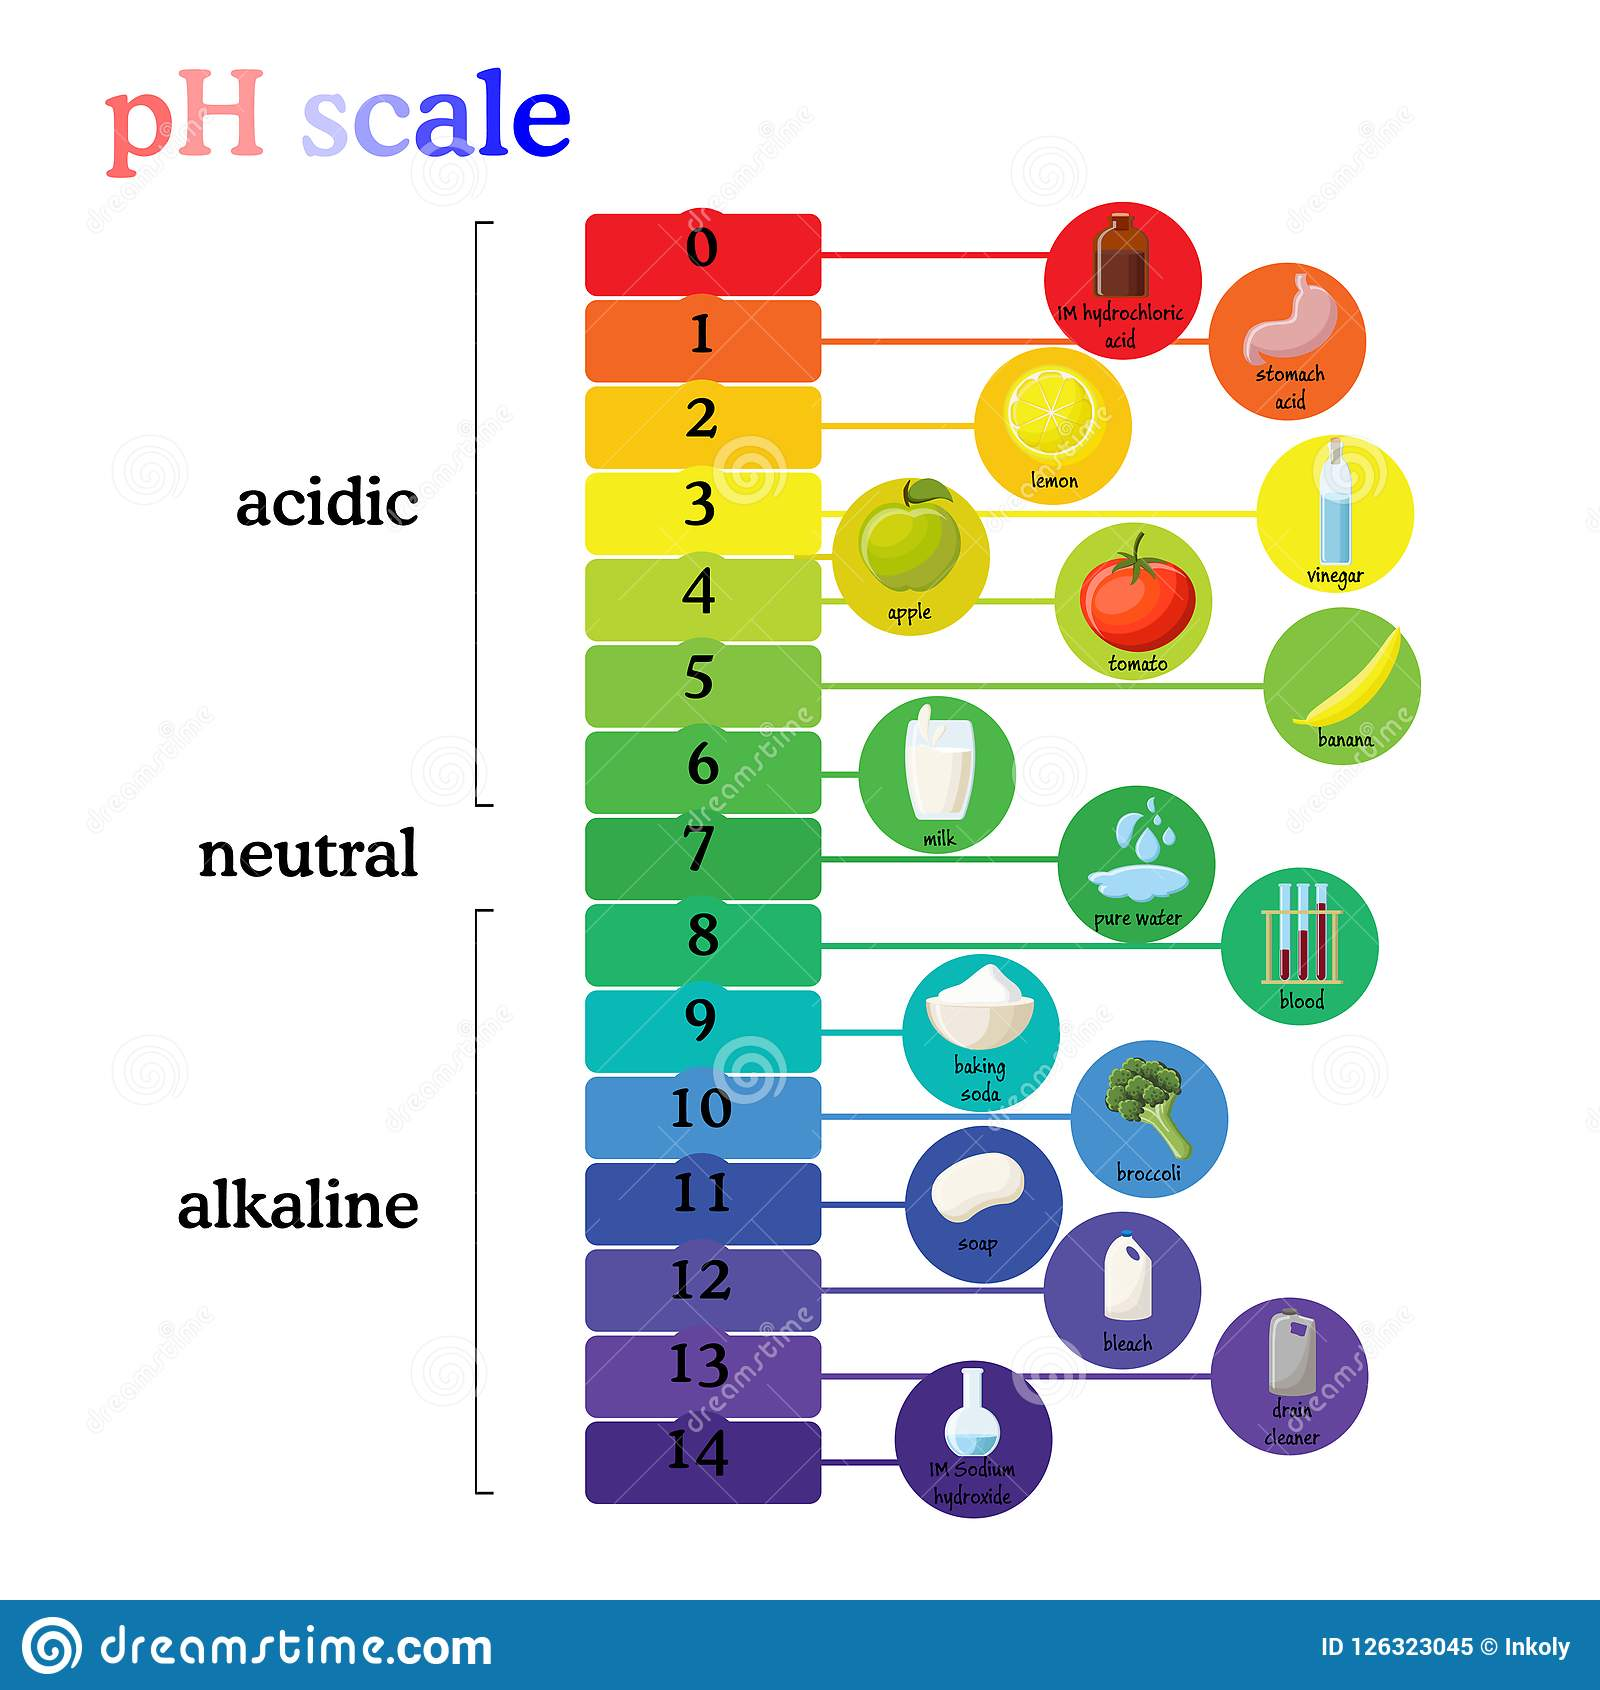 Ph Scale Diagram With Corresponding Acidic Or Alkaline